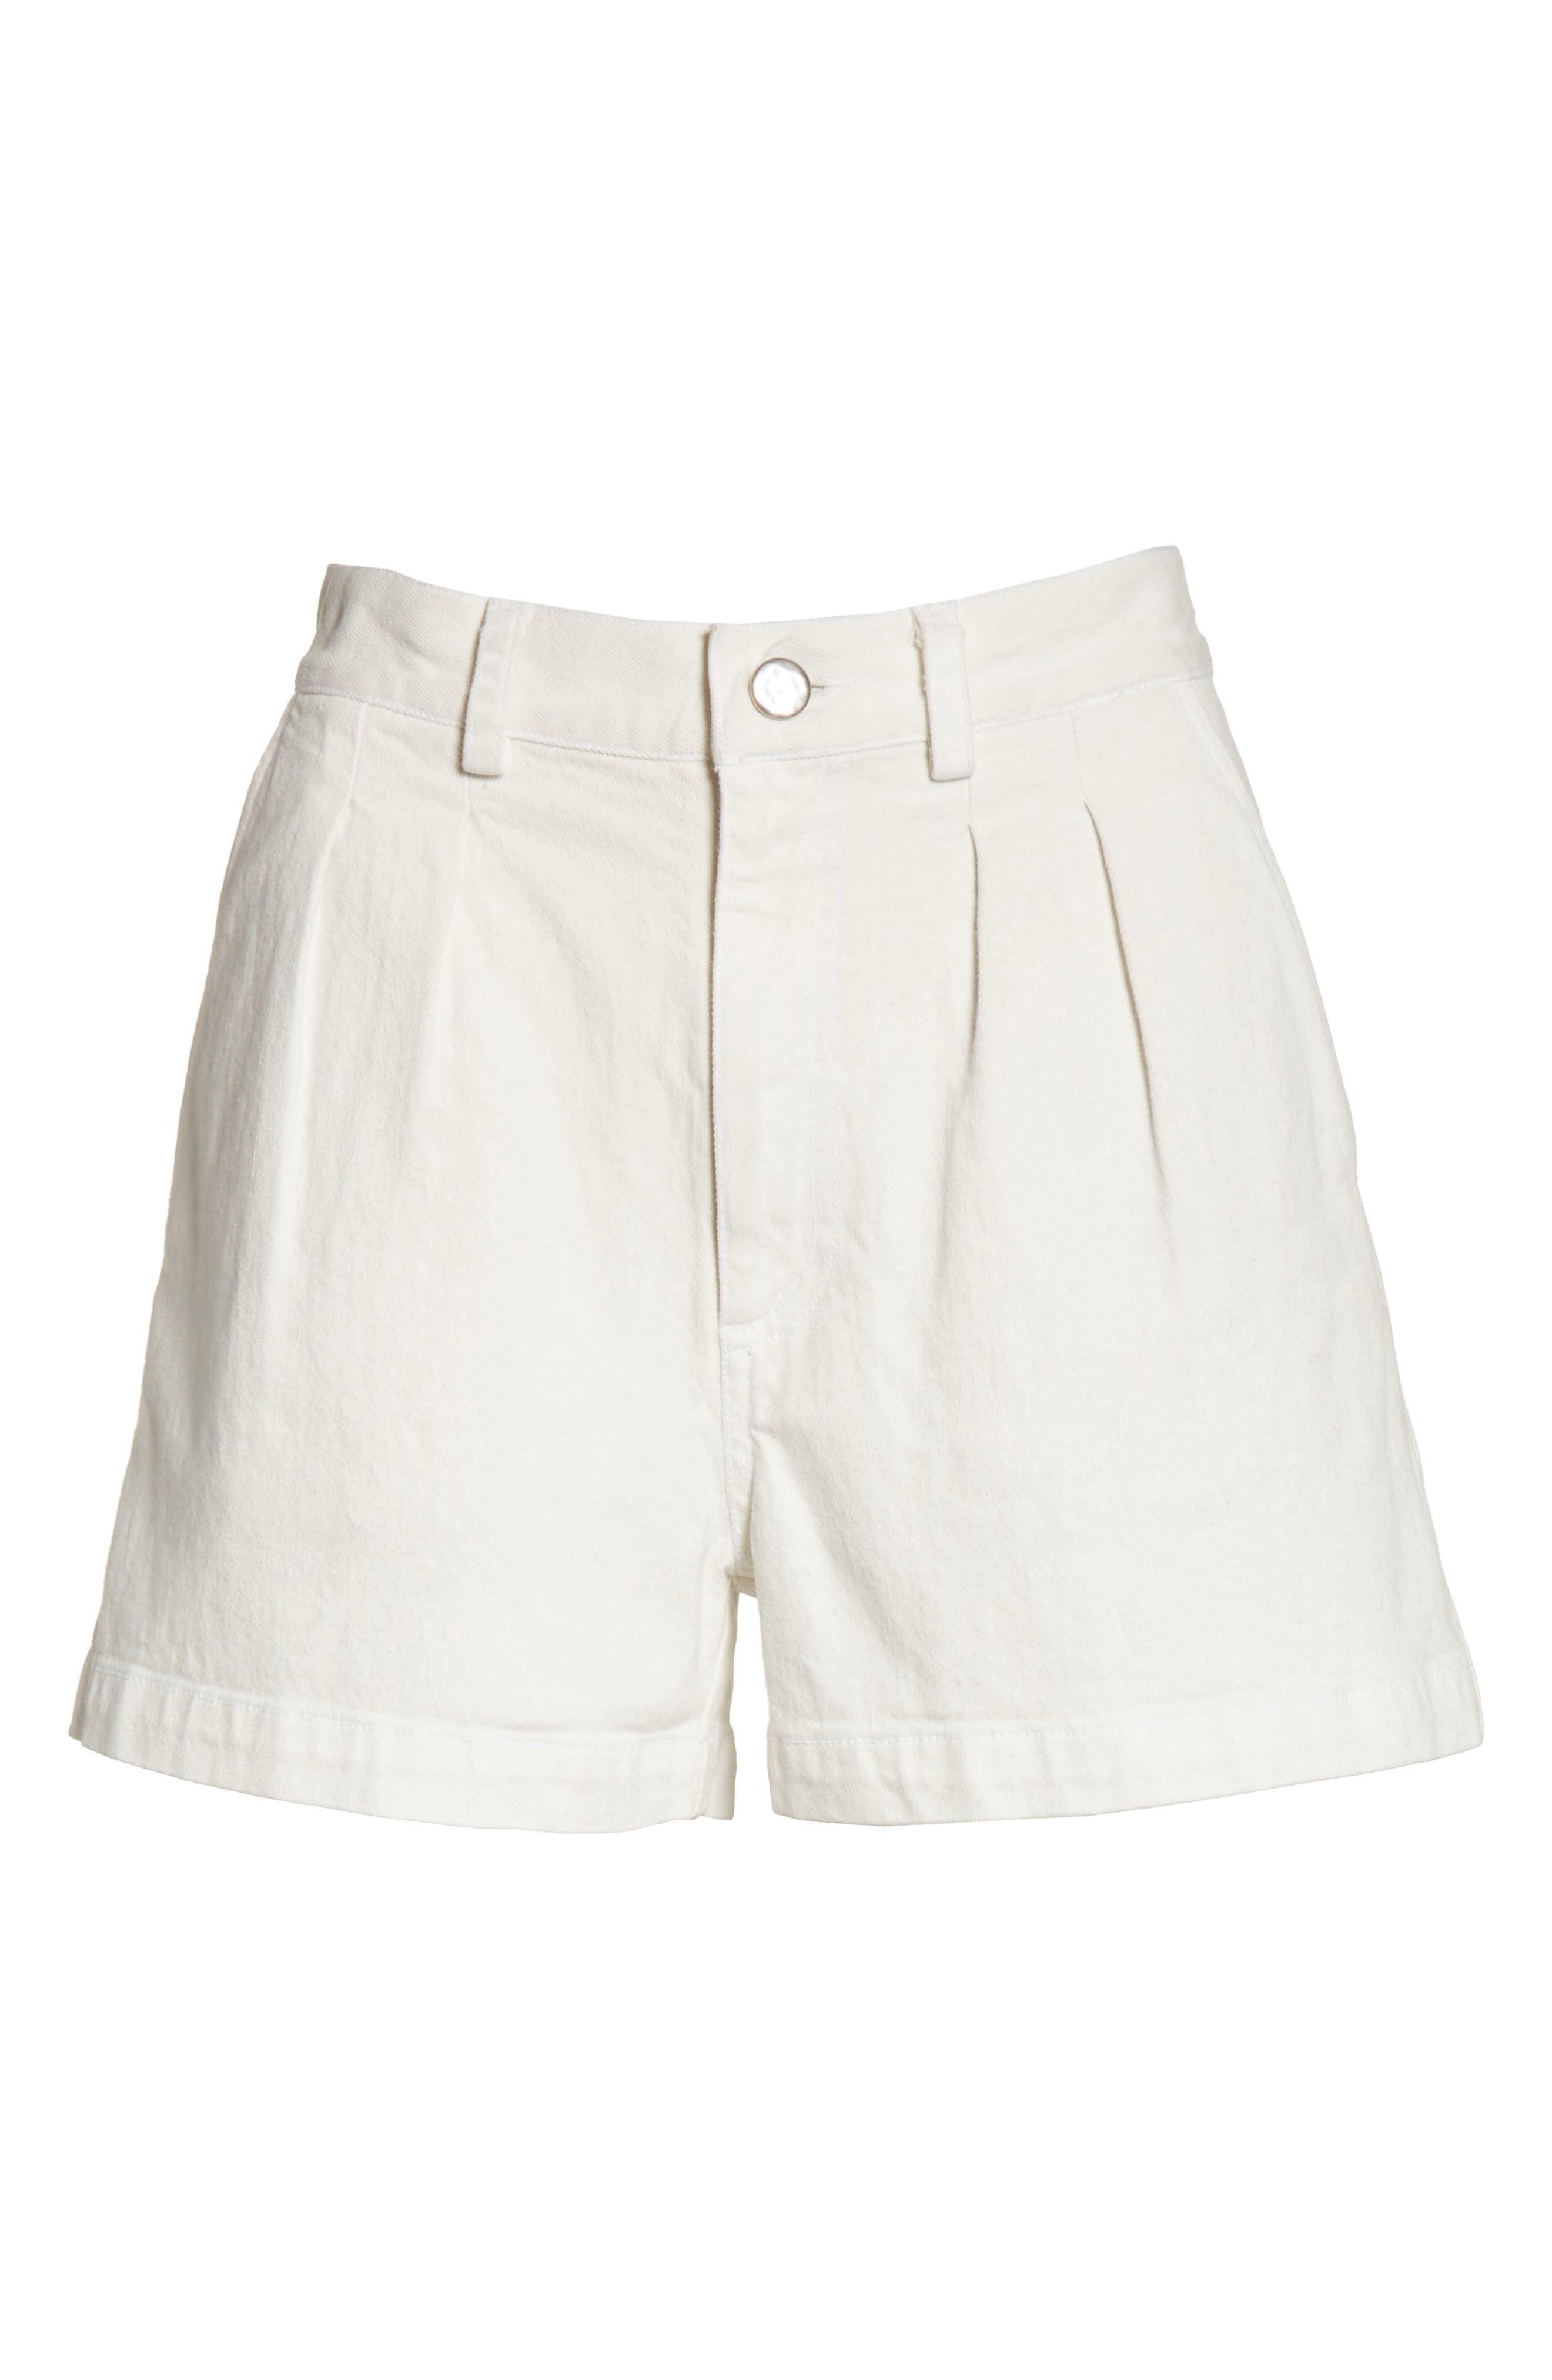 Daft Denim Shorts,                             Alternate thumbnail 6, color,                             Dirty White